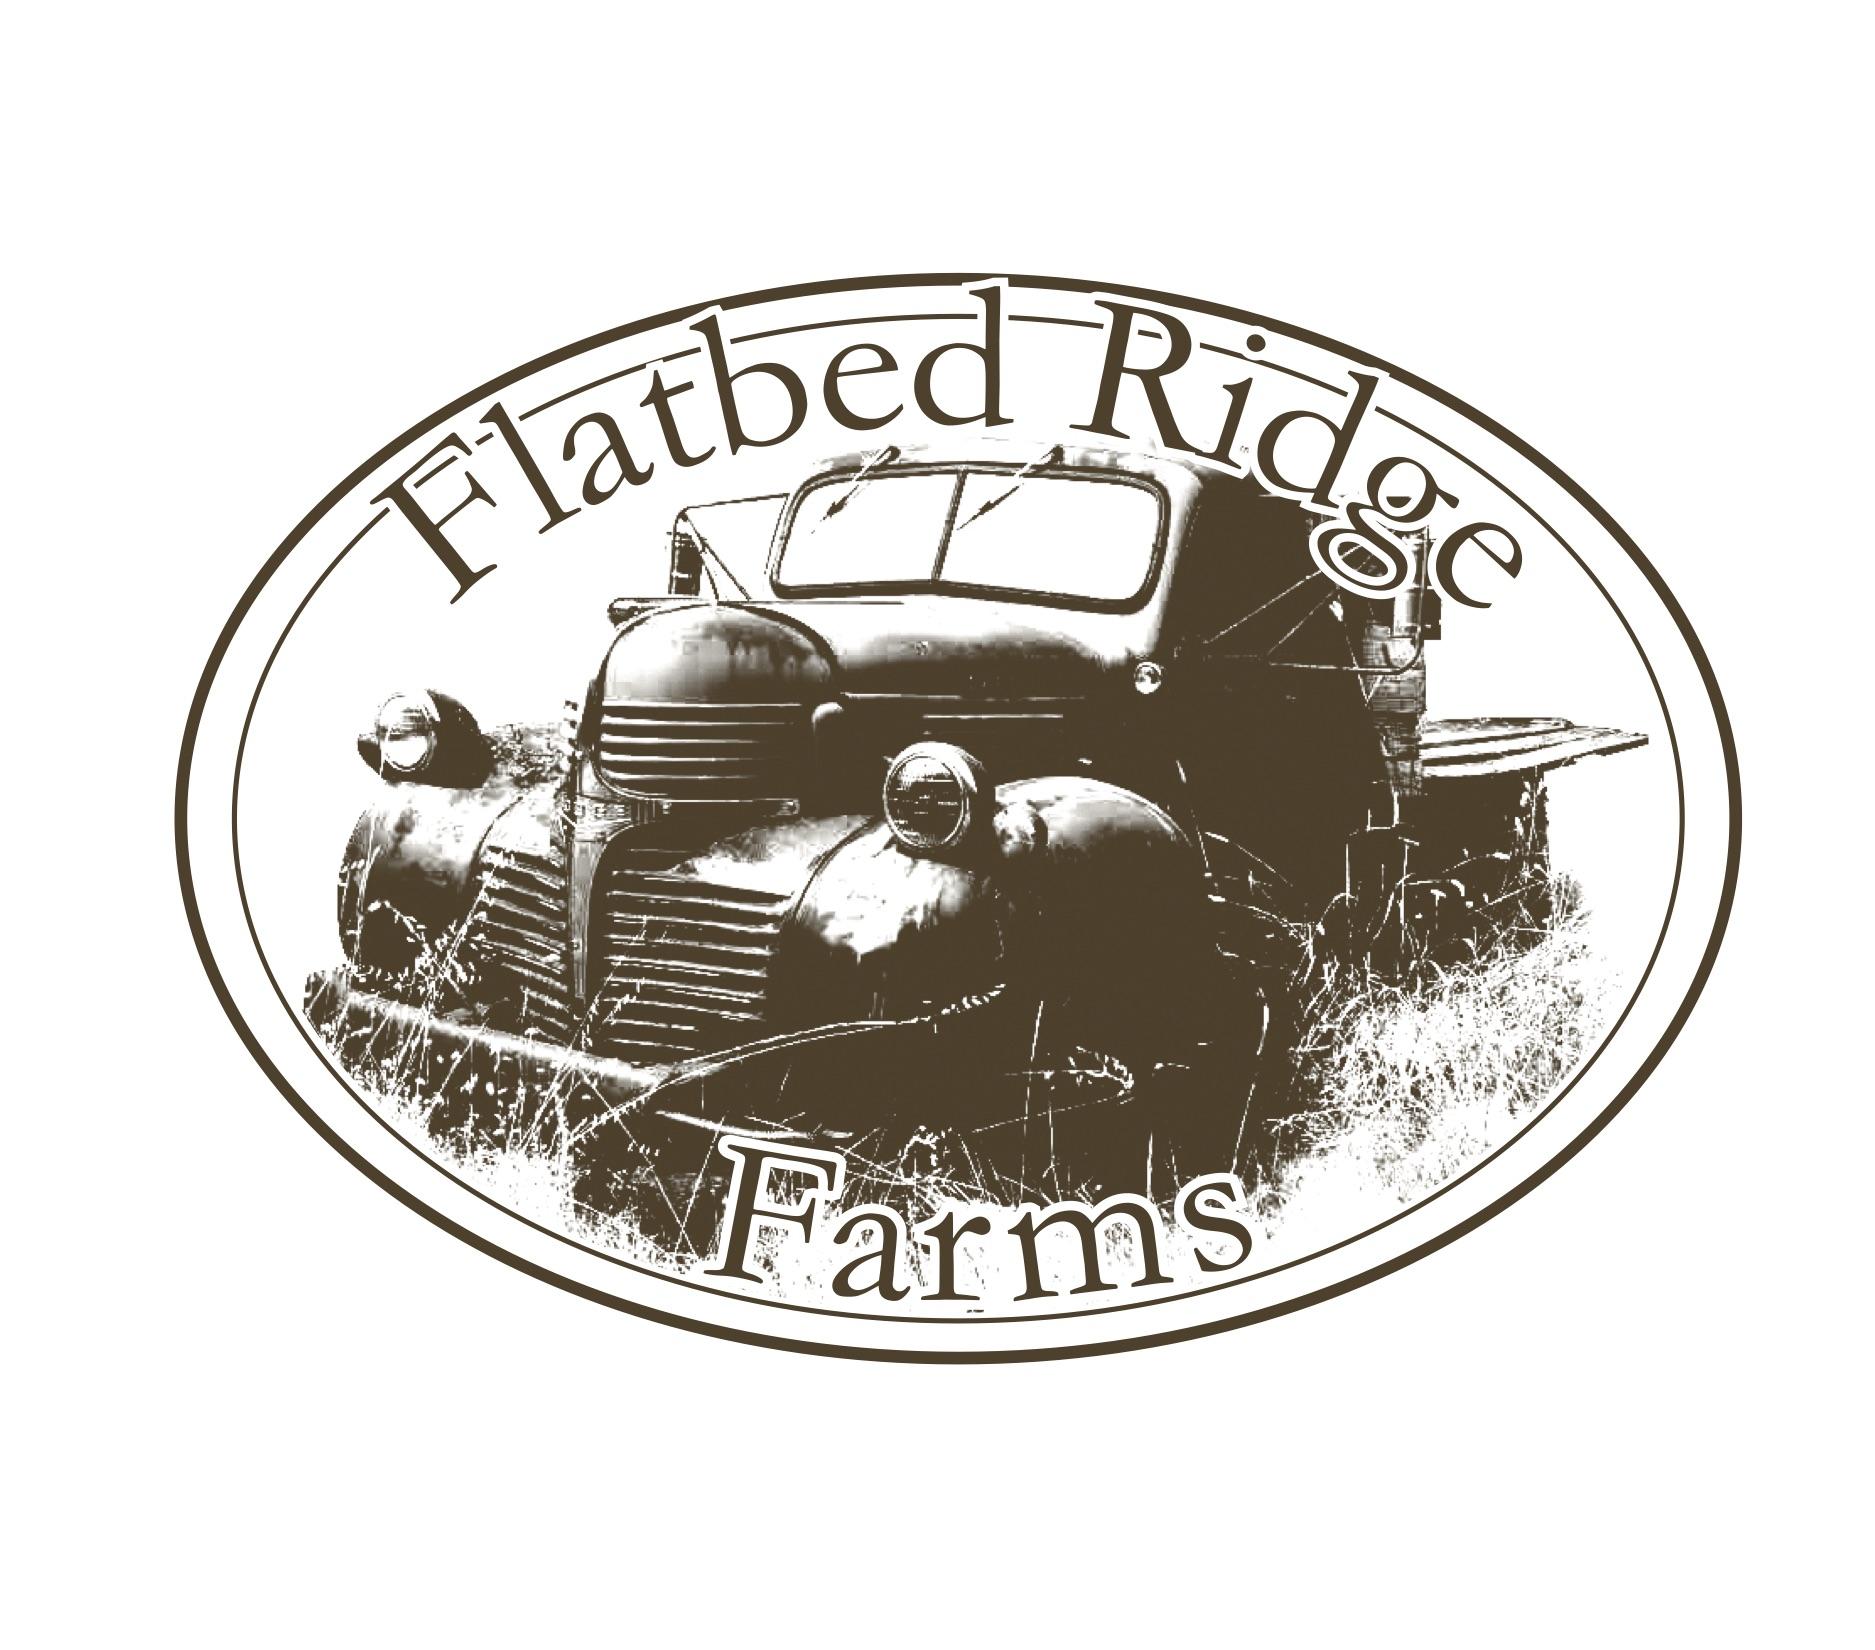 Flatbed Ridge Farms Logo.jpg